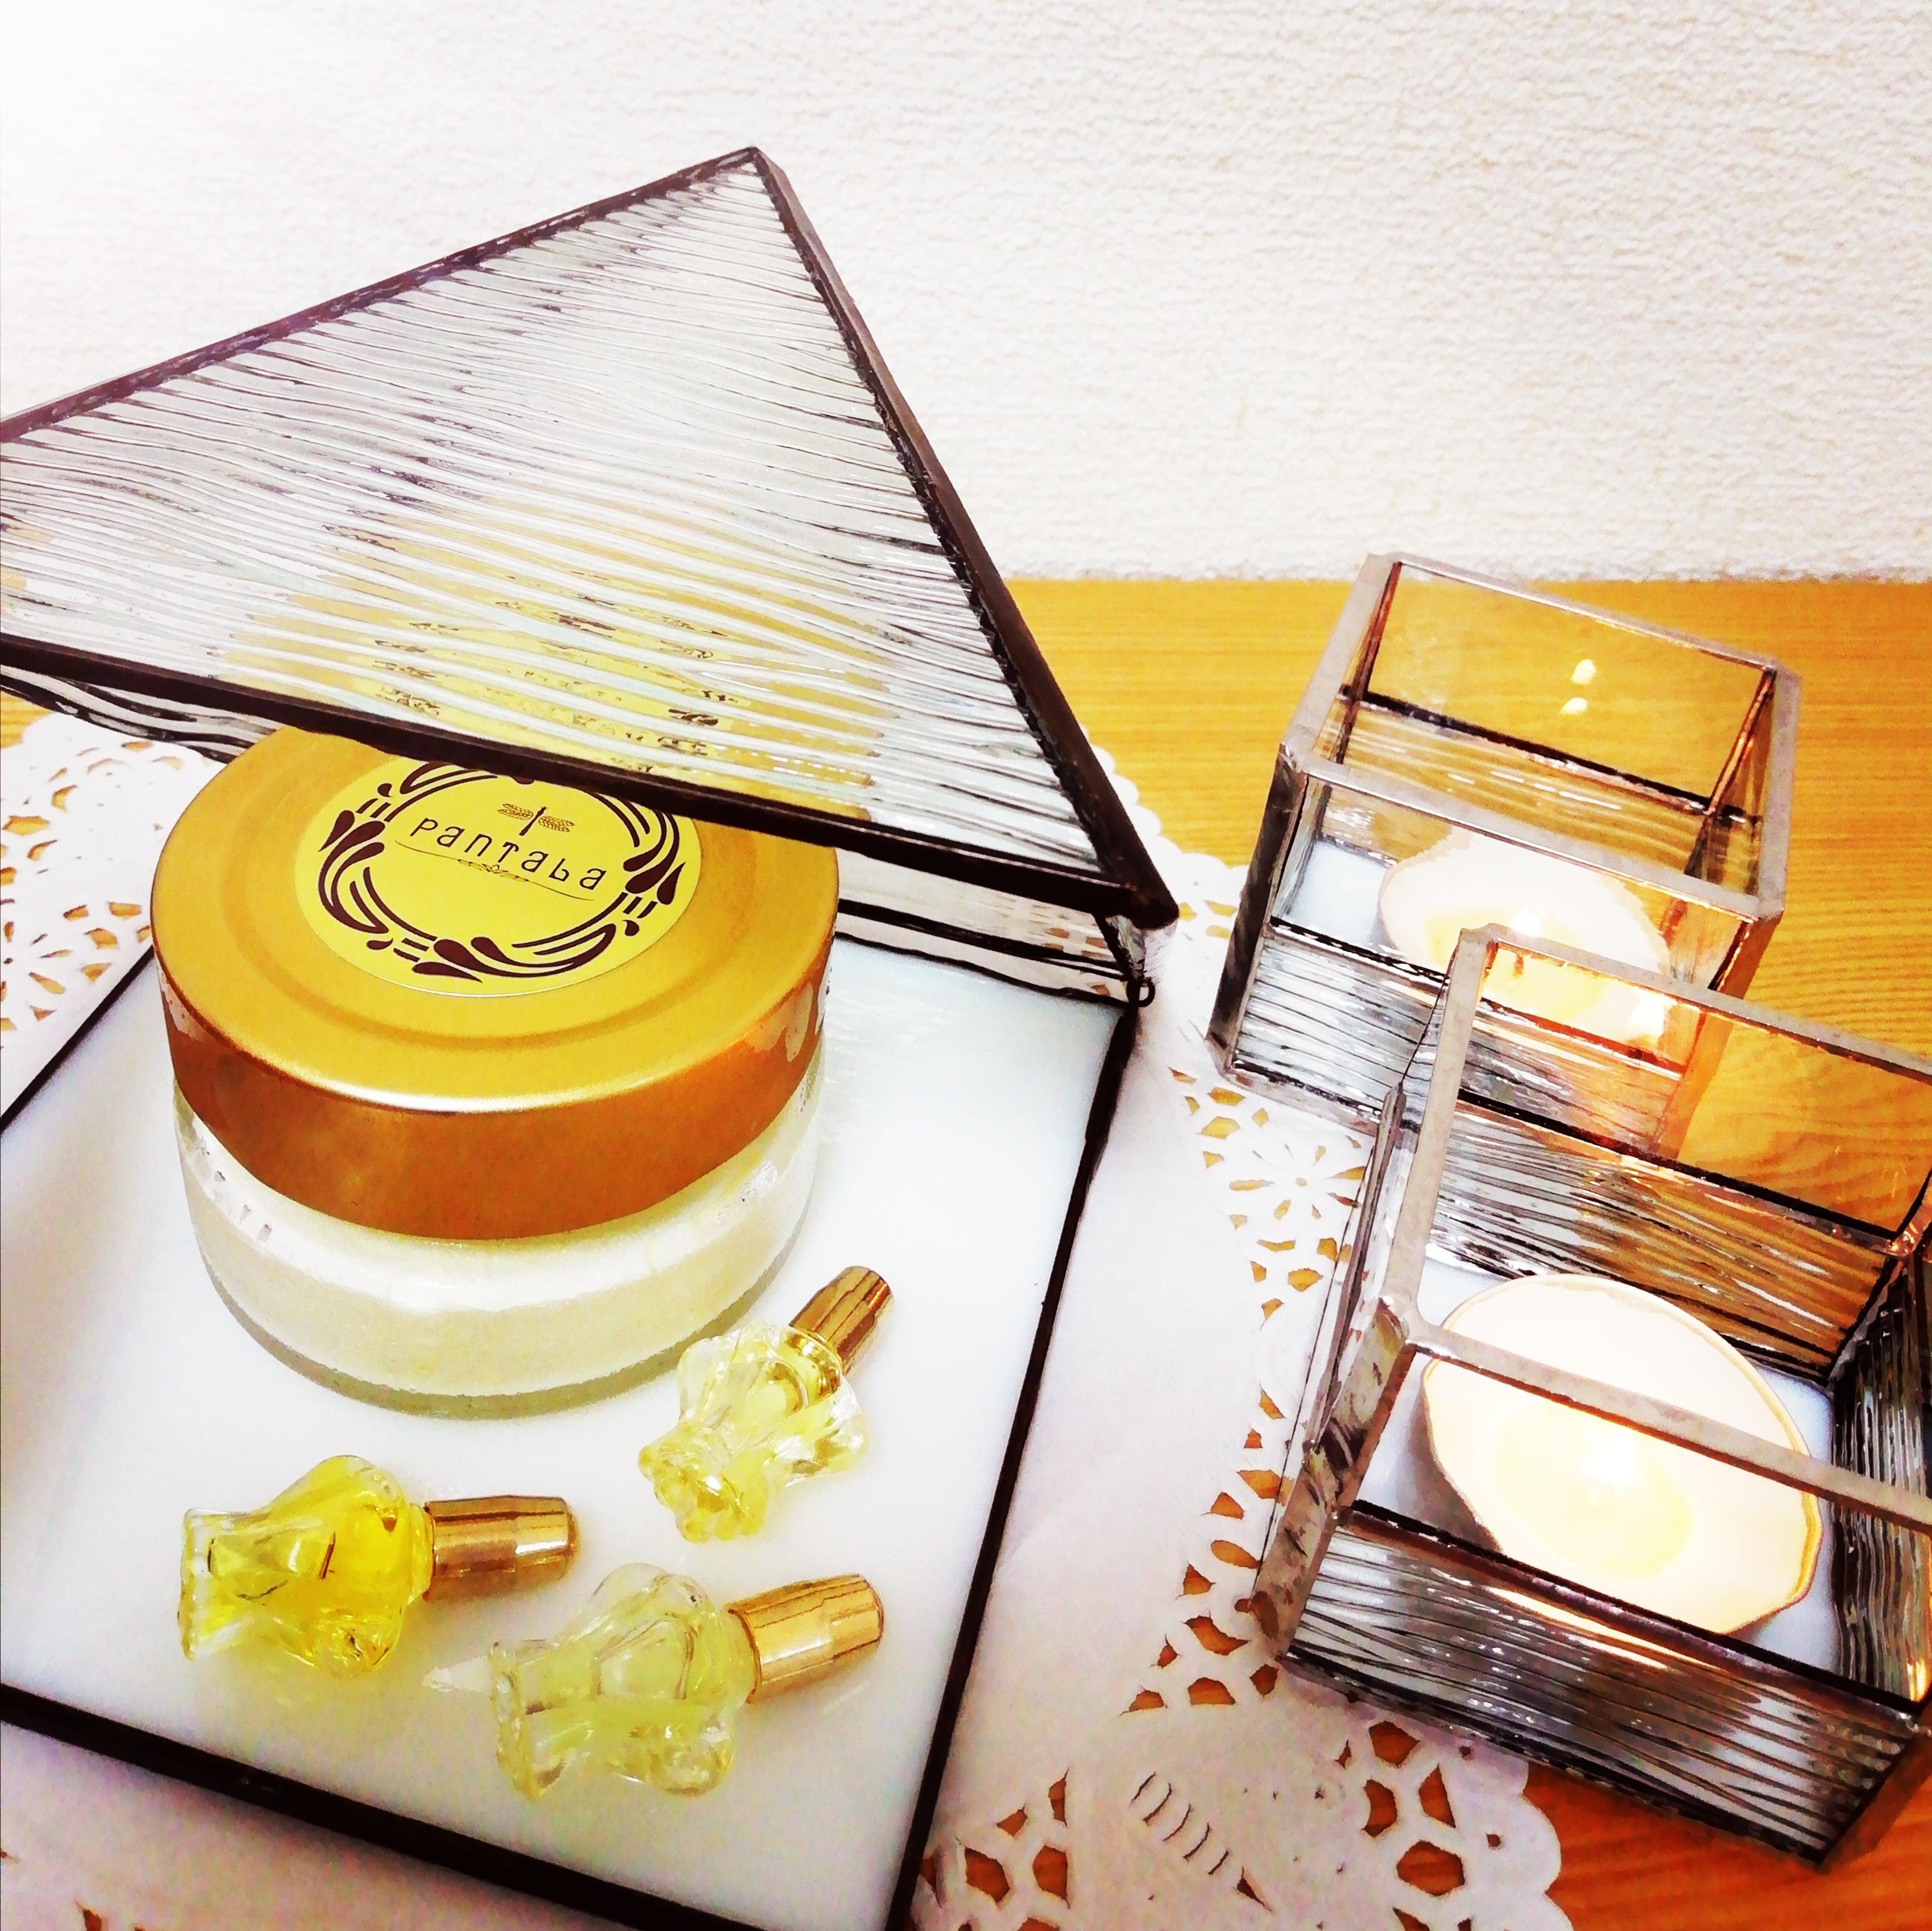 WPlatinum Gift☆クリスマスコフレ☆Limited ランチ付きお話会のイメージその3